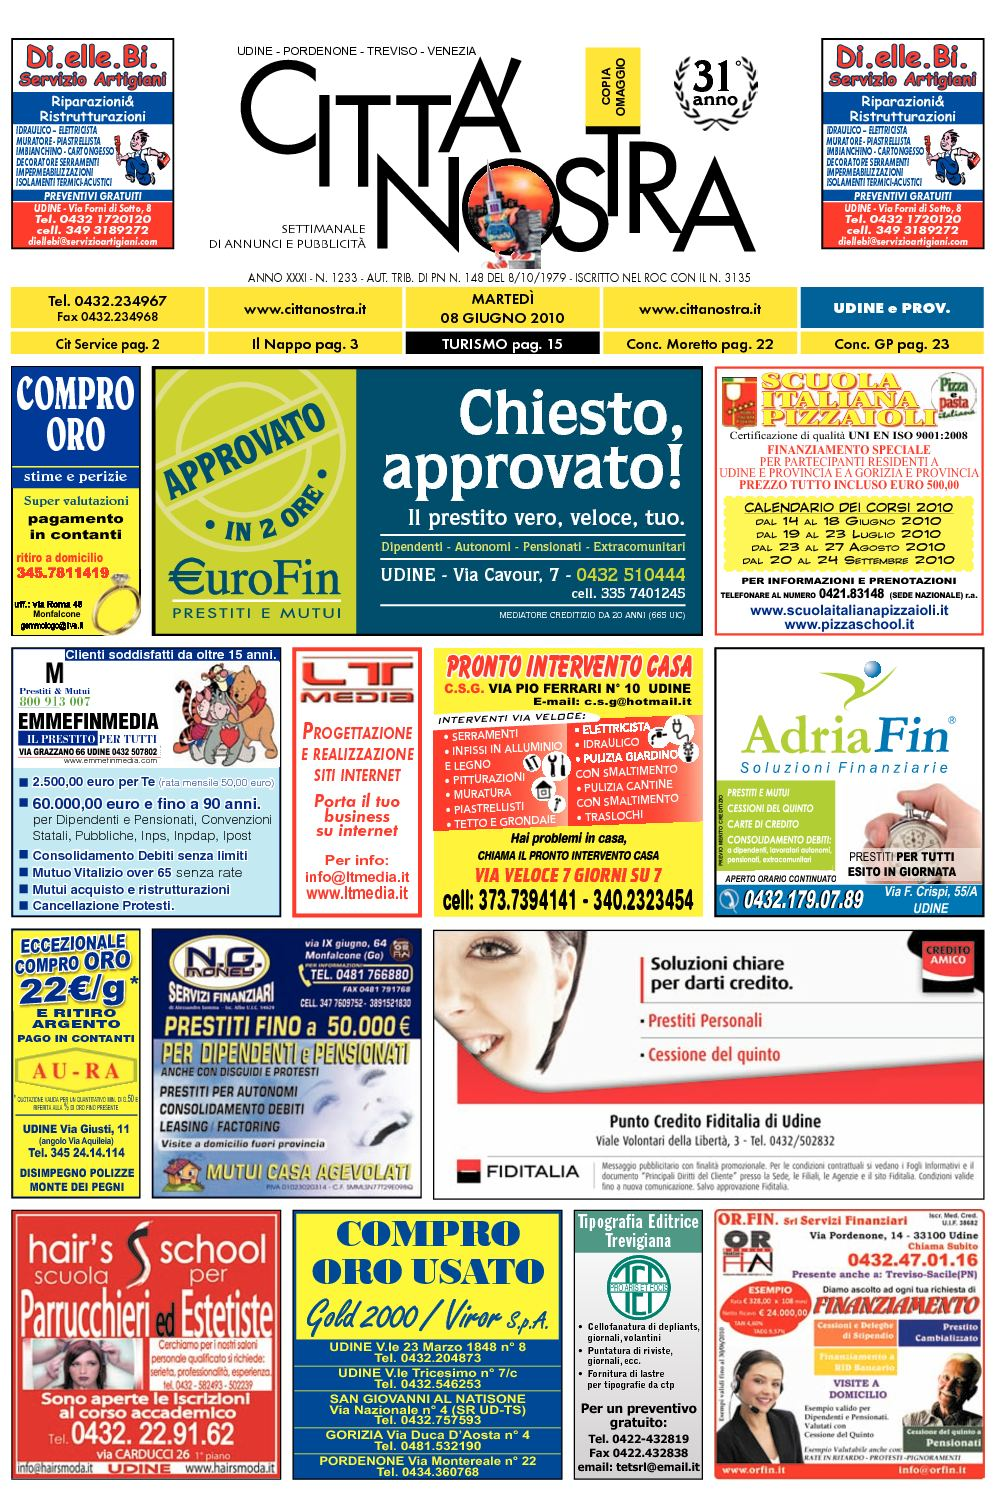 Calaméo Città Nostra Udine del 08.06.2010 n. 1233